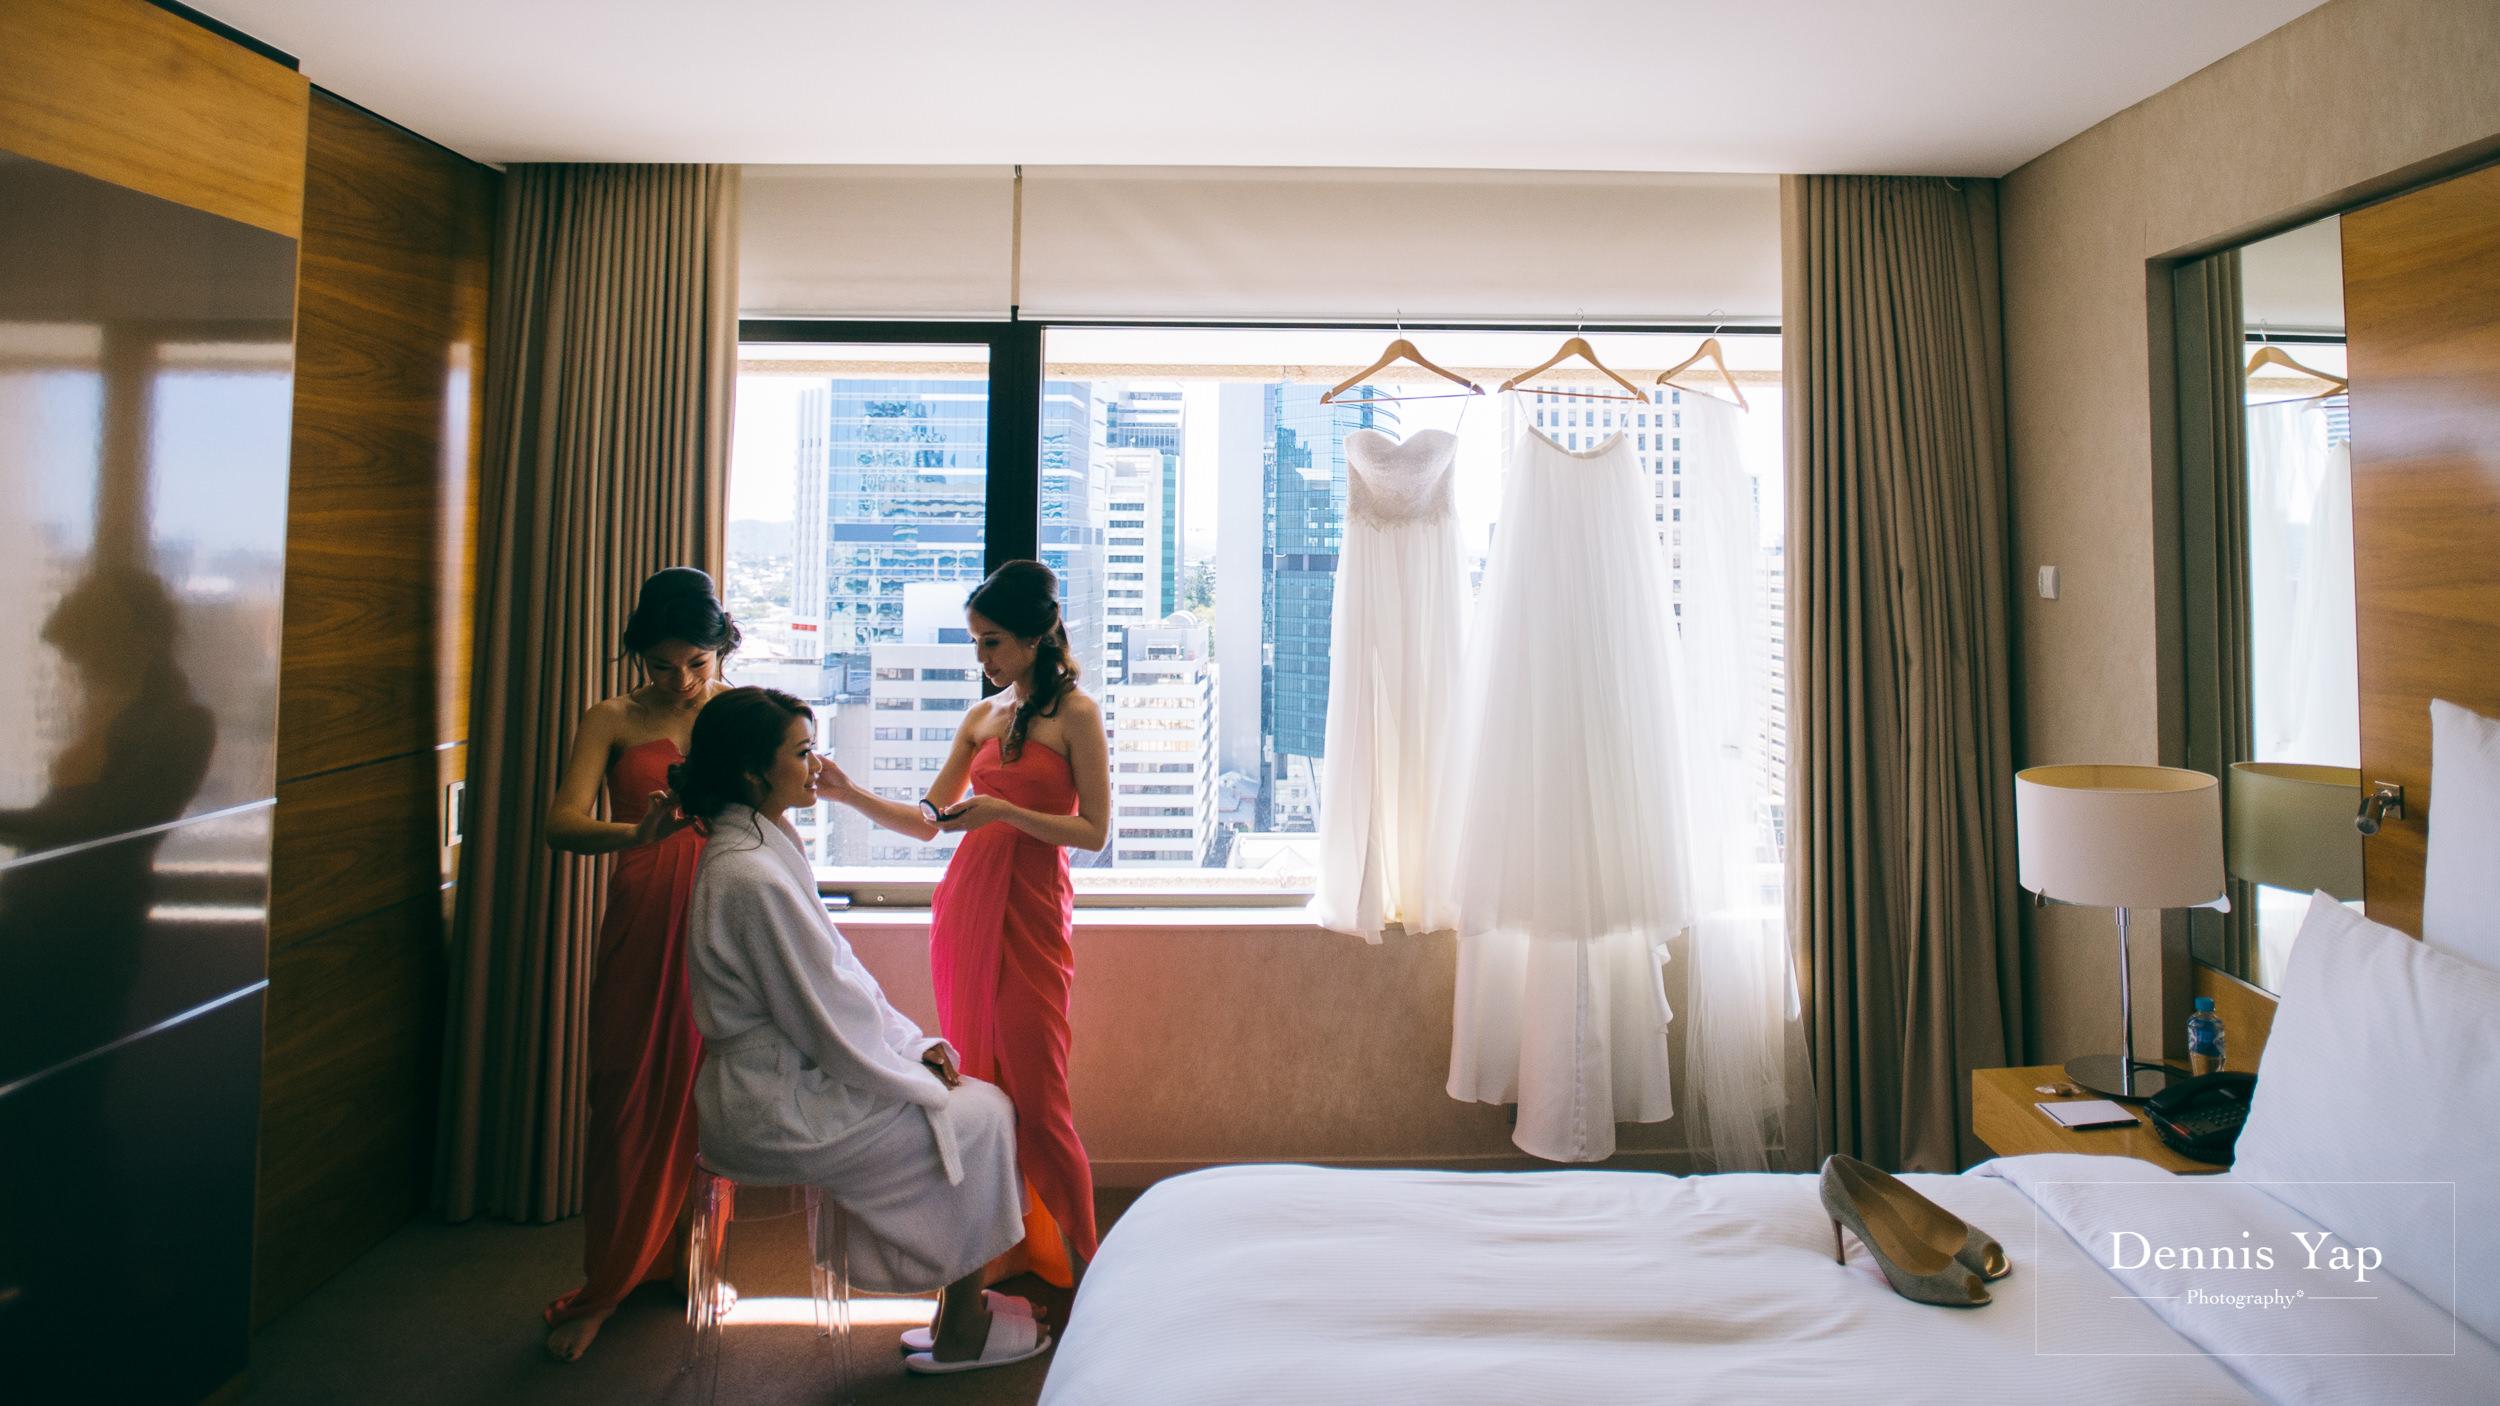 thang veng vietnamese wedding brisbane dennis yap photography malaysia wedding photographer-13.jpg